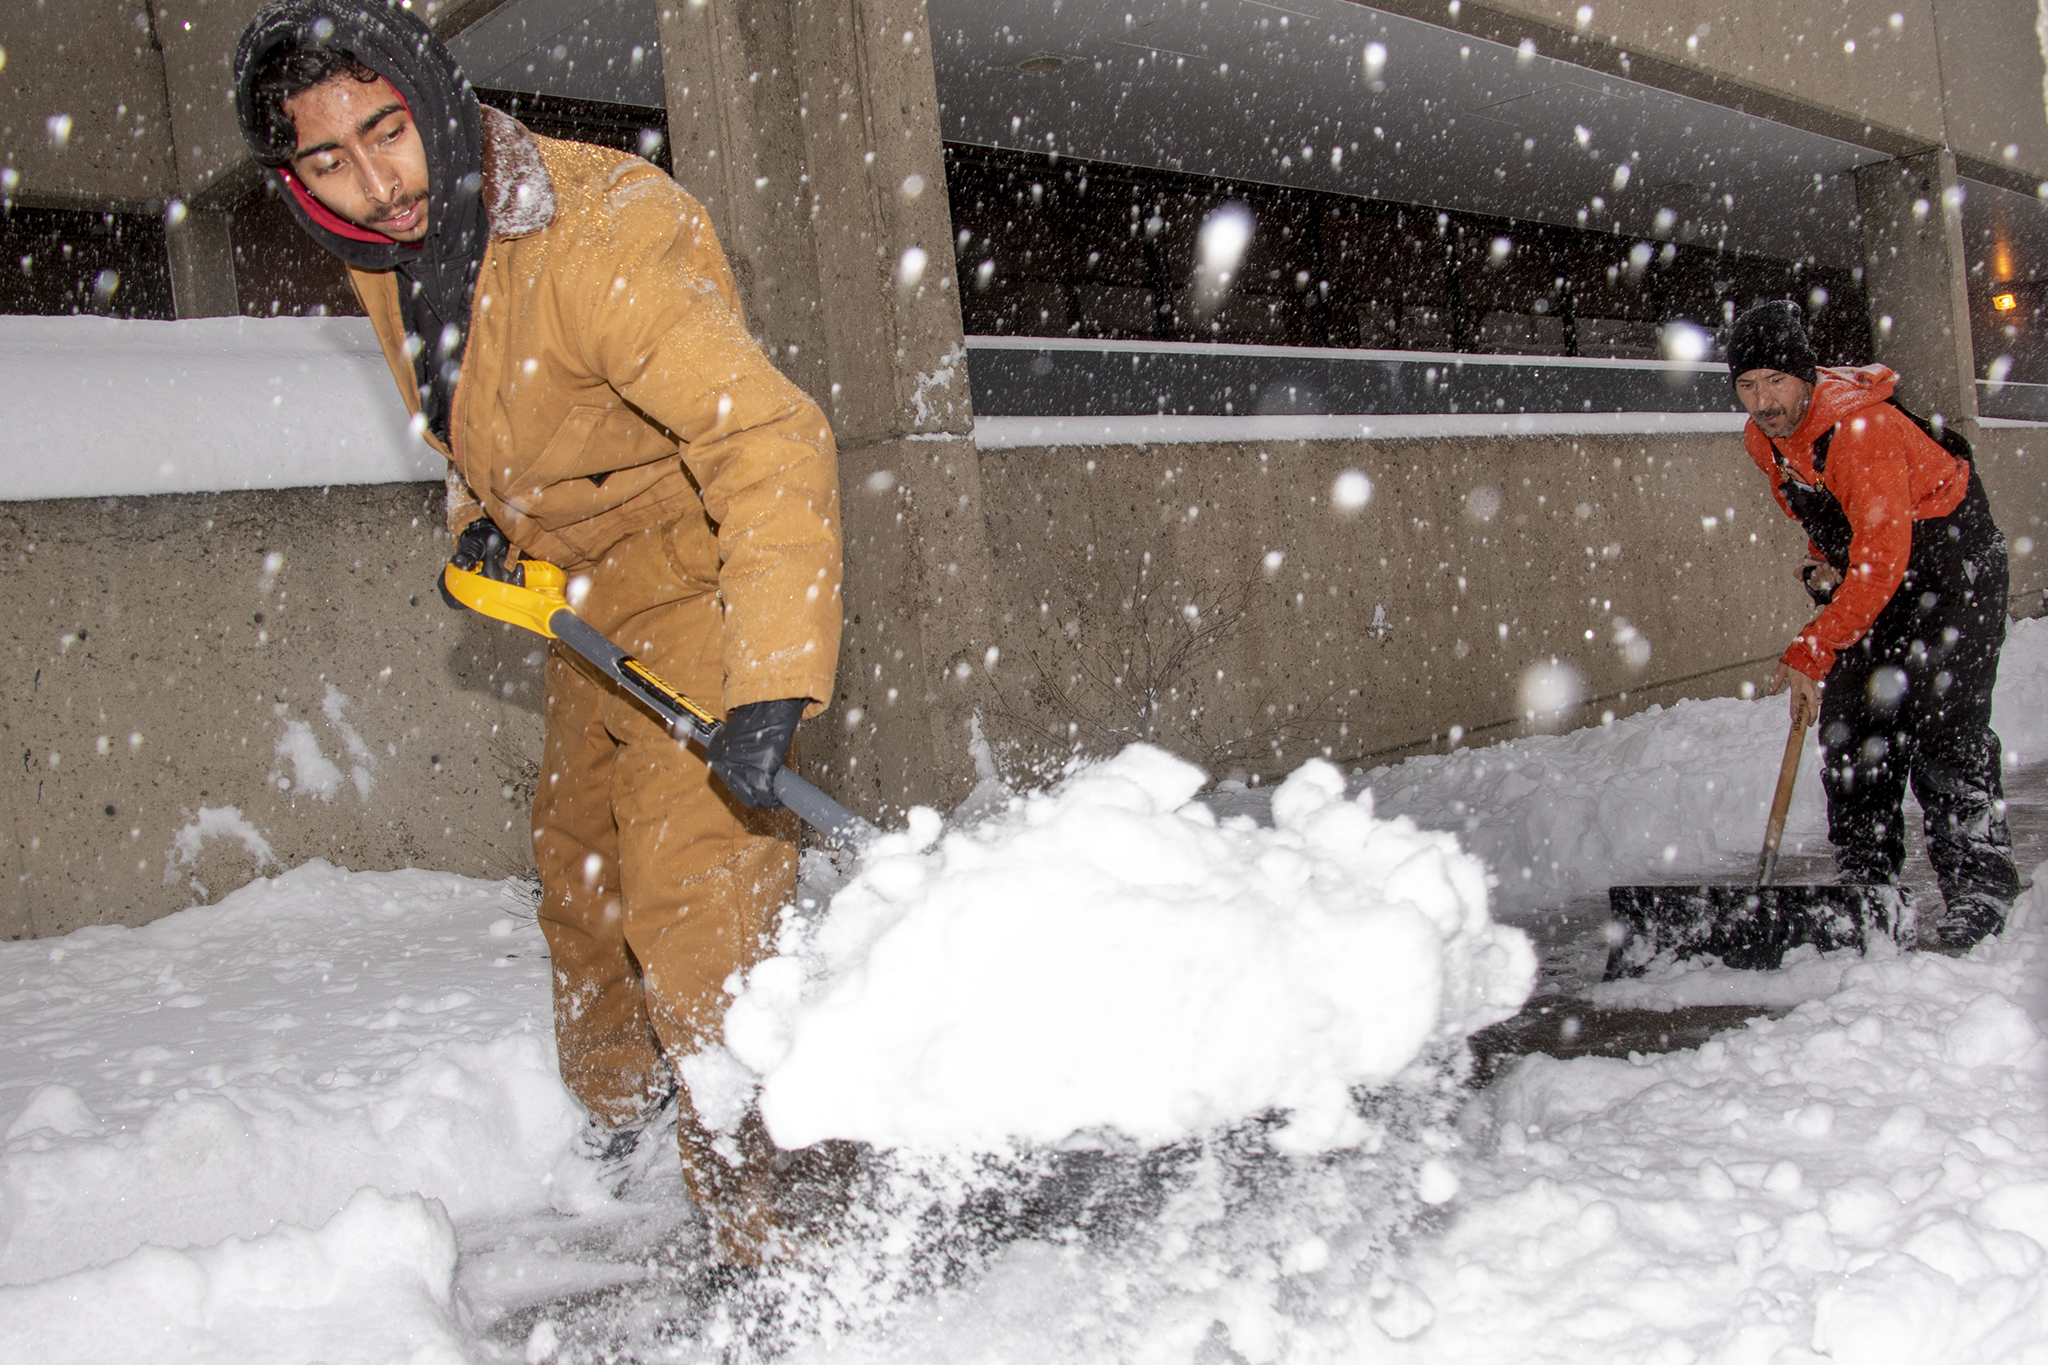 Jovony (left) and Hondo Padilla shovel snow on Lincoln Street, Nov. 26, 2019.